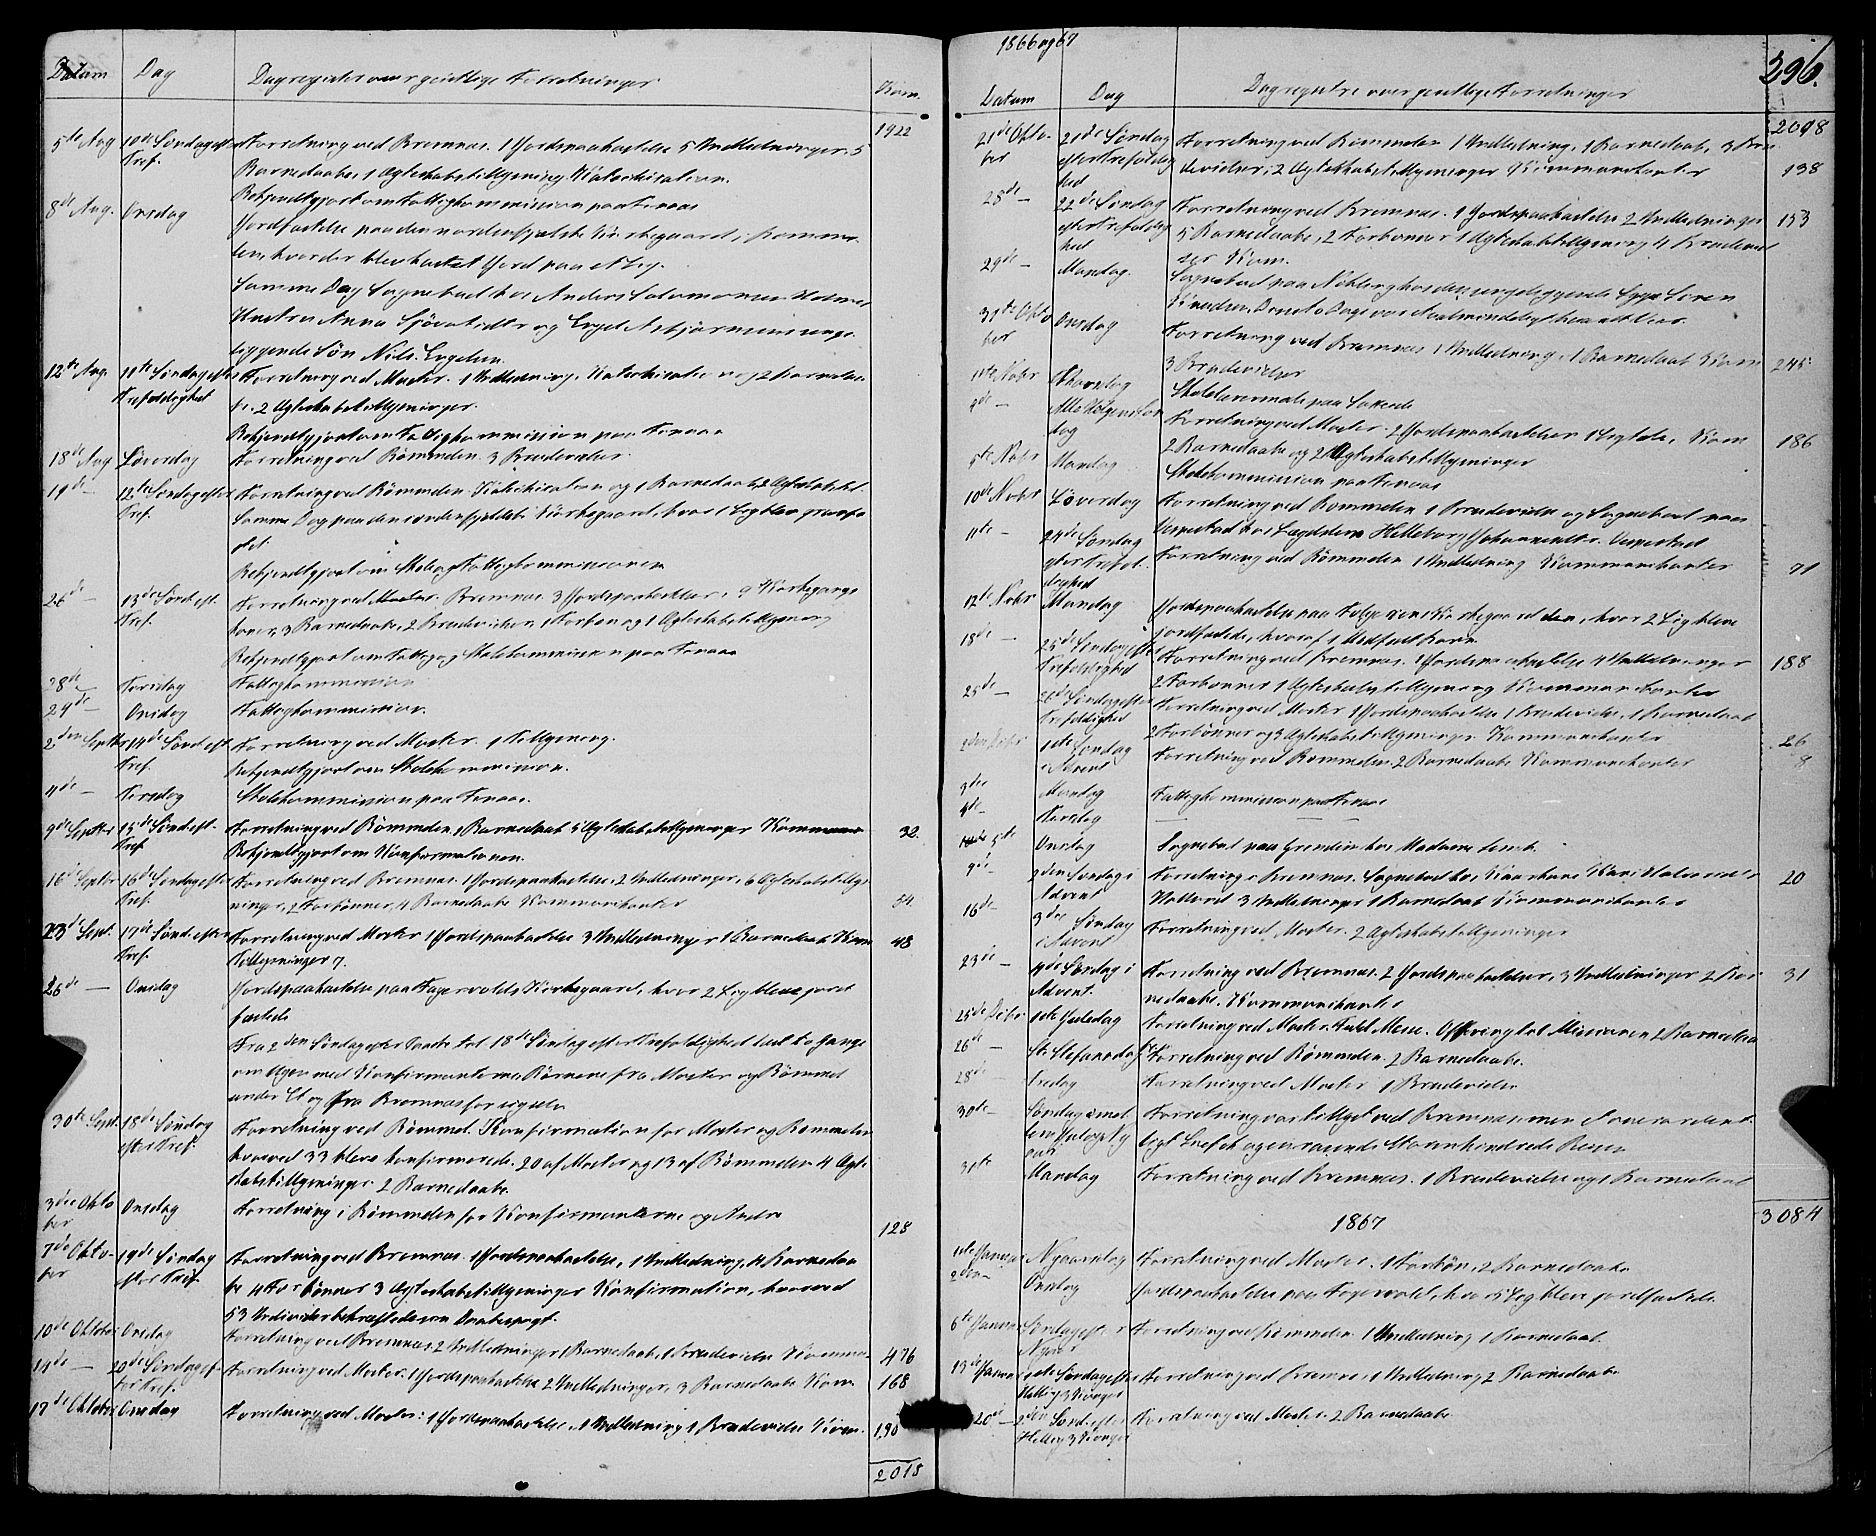 SAB, Finnås sokneprestembete, H/Ha/Haa/Haaa/L0008: Ministerialbok nr. A 8, 1863-1872, s. 296